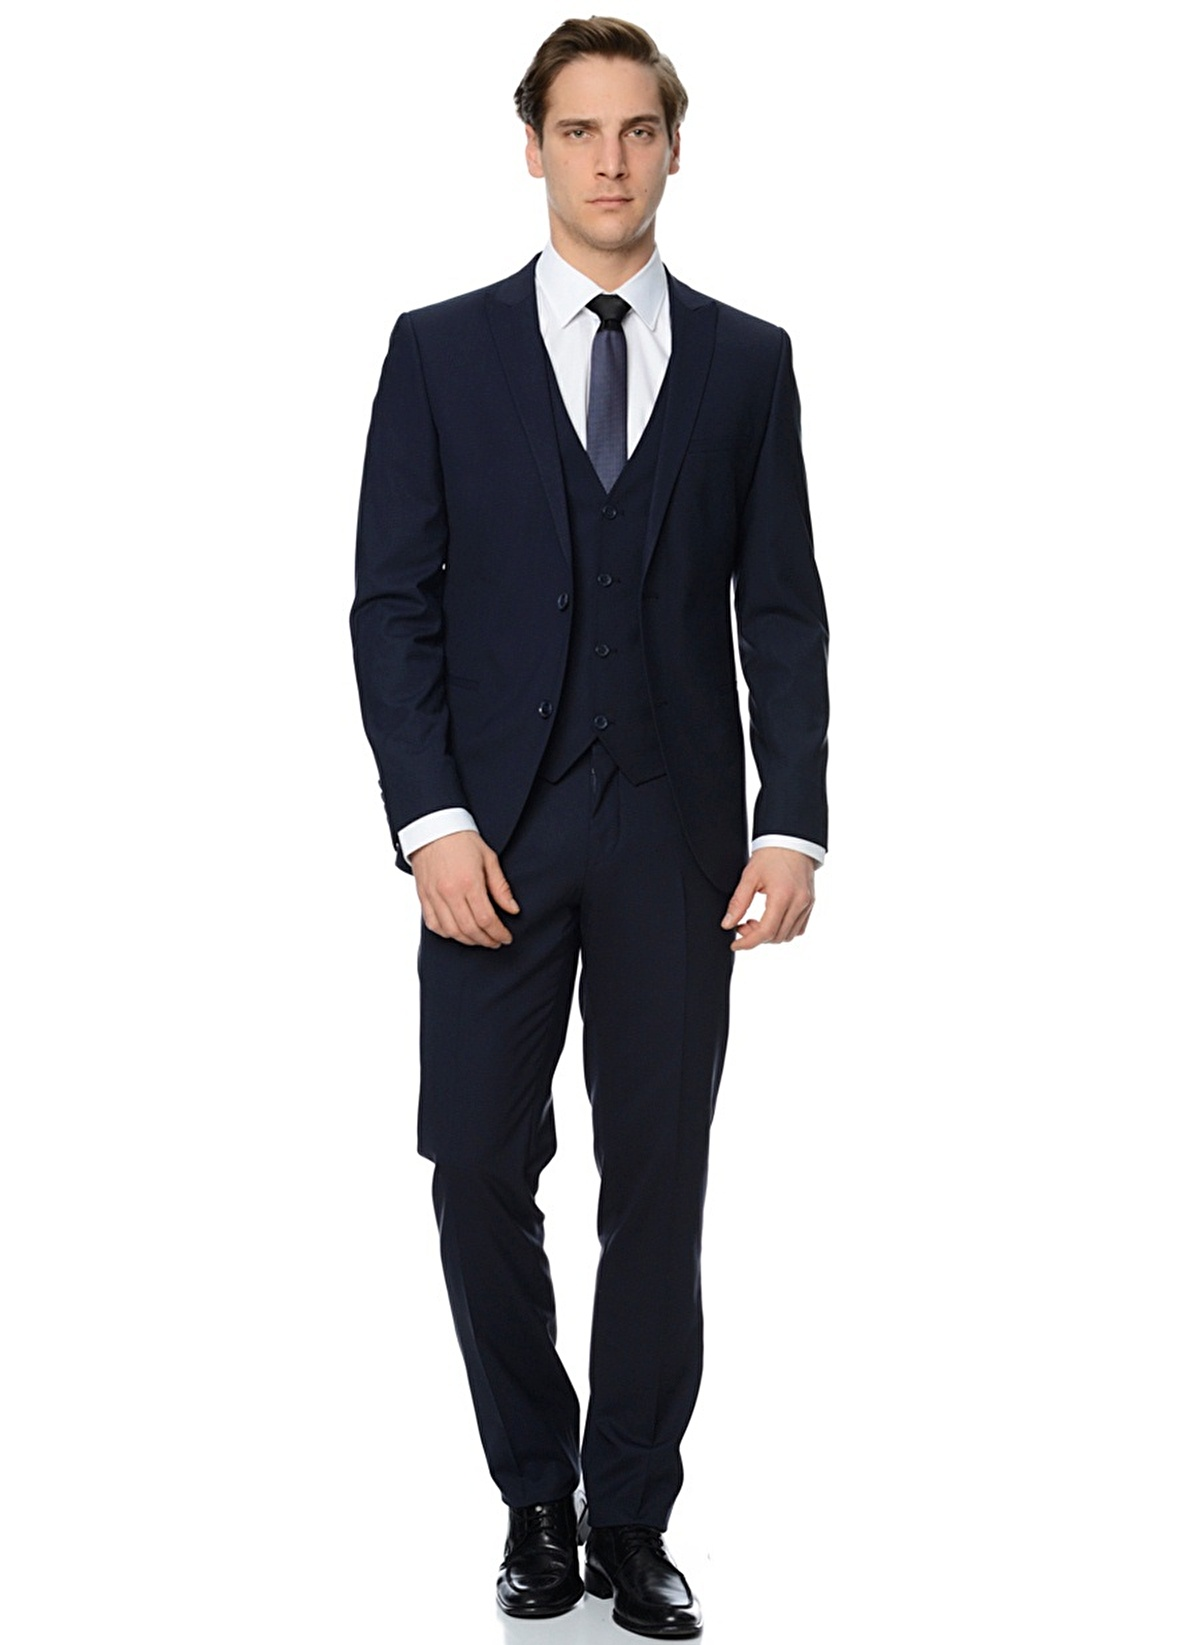 800a46b47a46f Beymen Business Erkek Takım Elbise Lacivert | Morhipo | 14861736